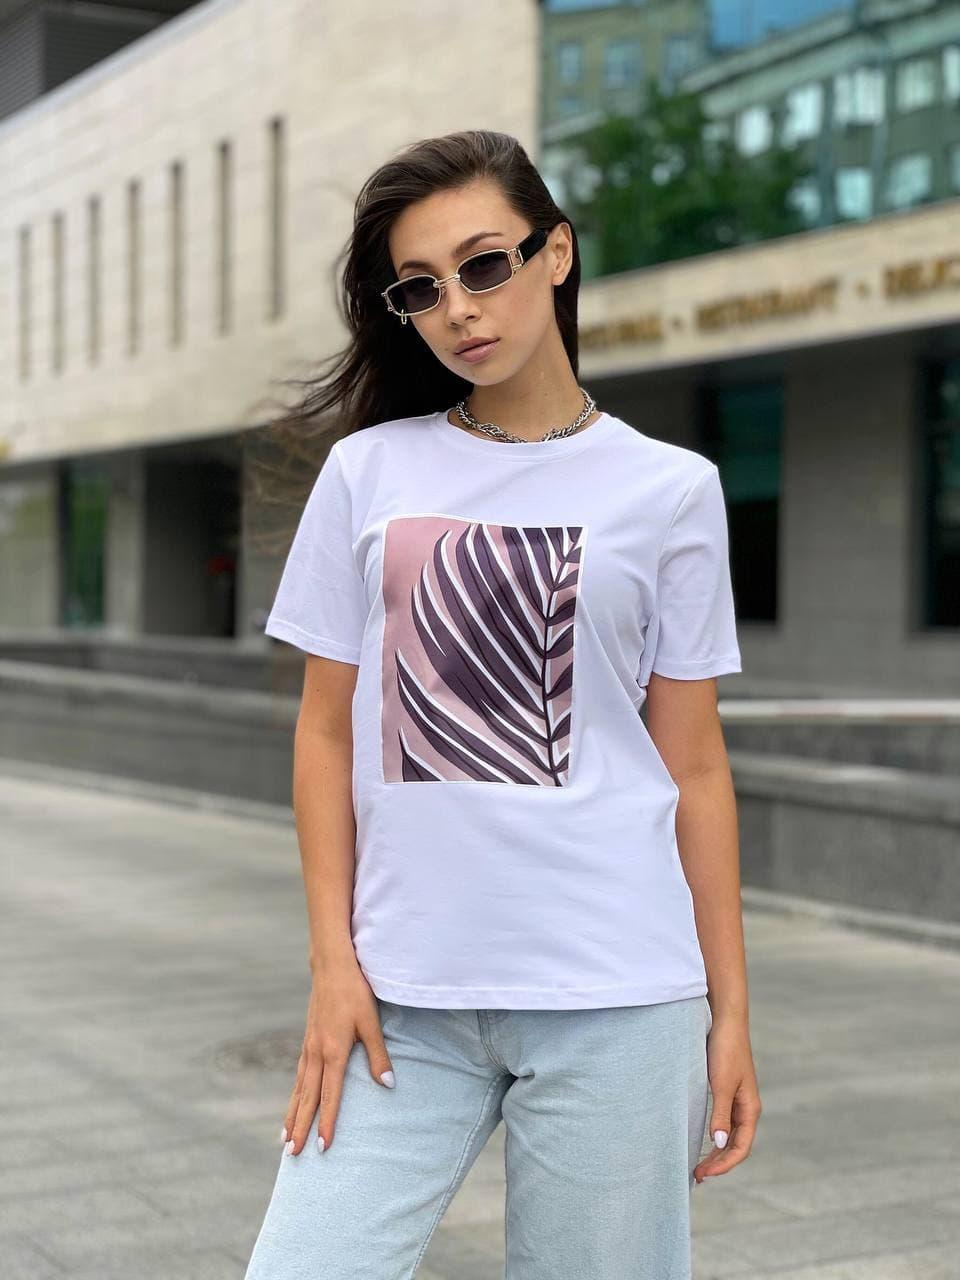 Женская прямая футболка оверсайз на лето с рисунком на груди (р. S, M, L) 5517533